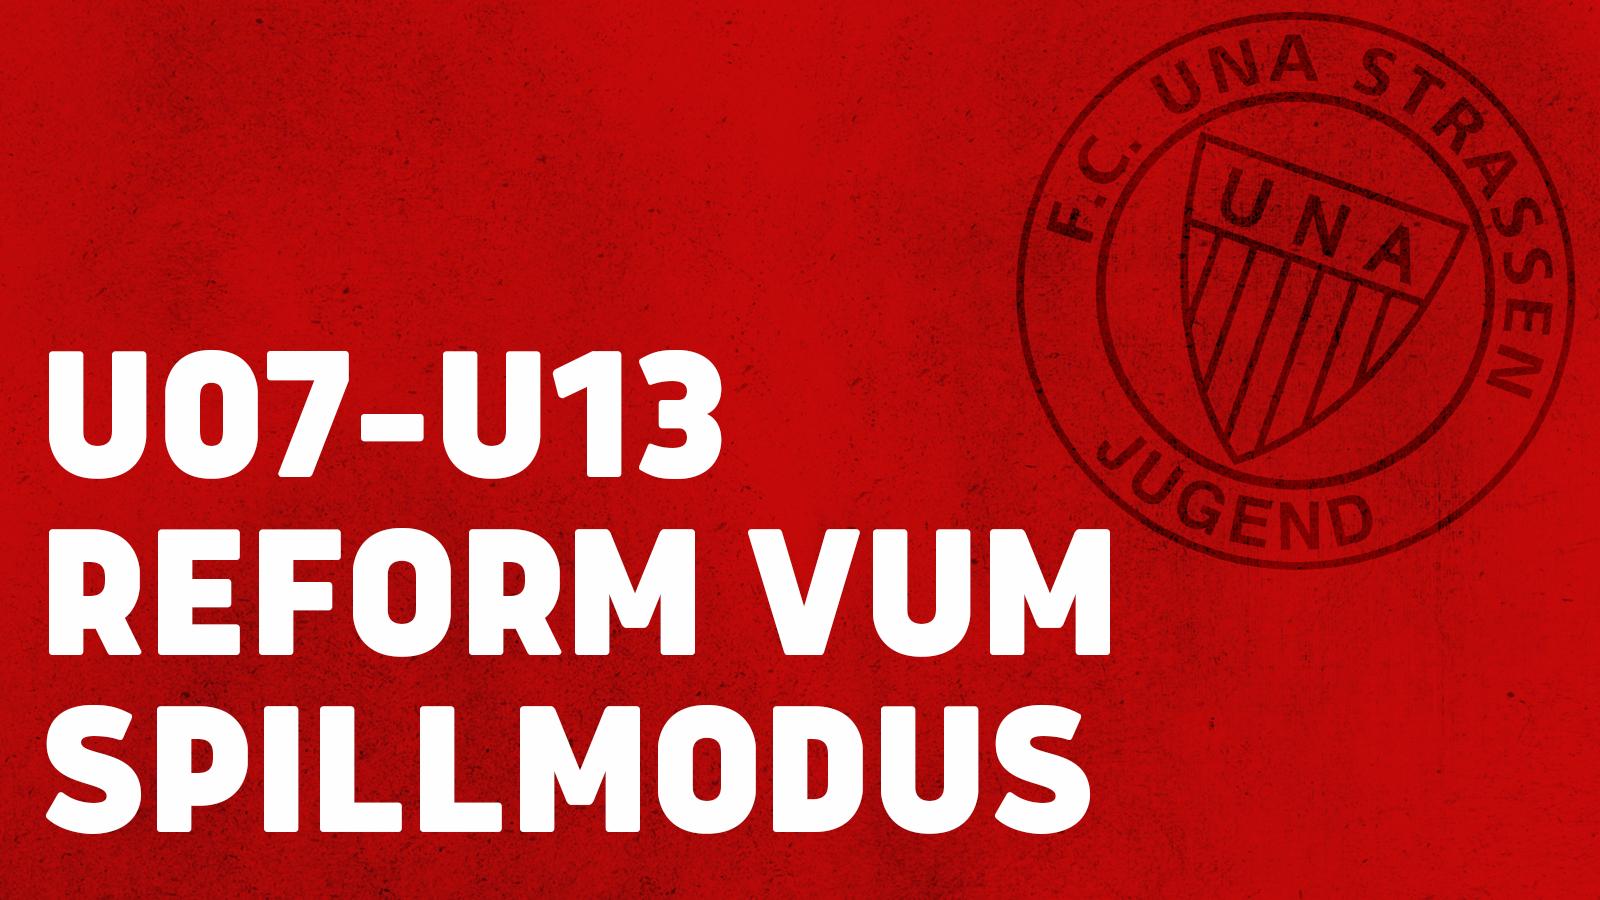 U07- U13 — Reform vum Spillmodus